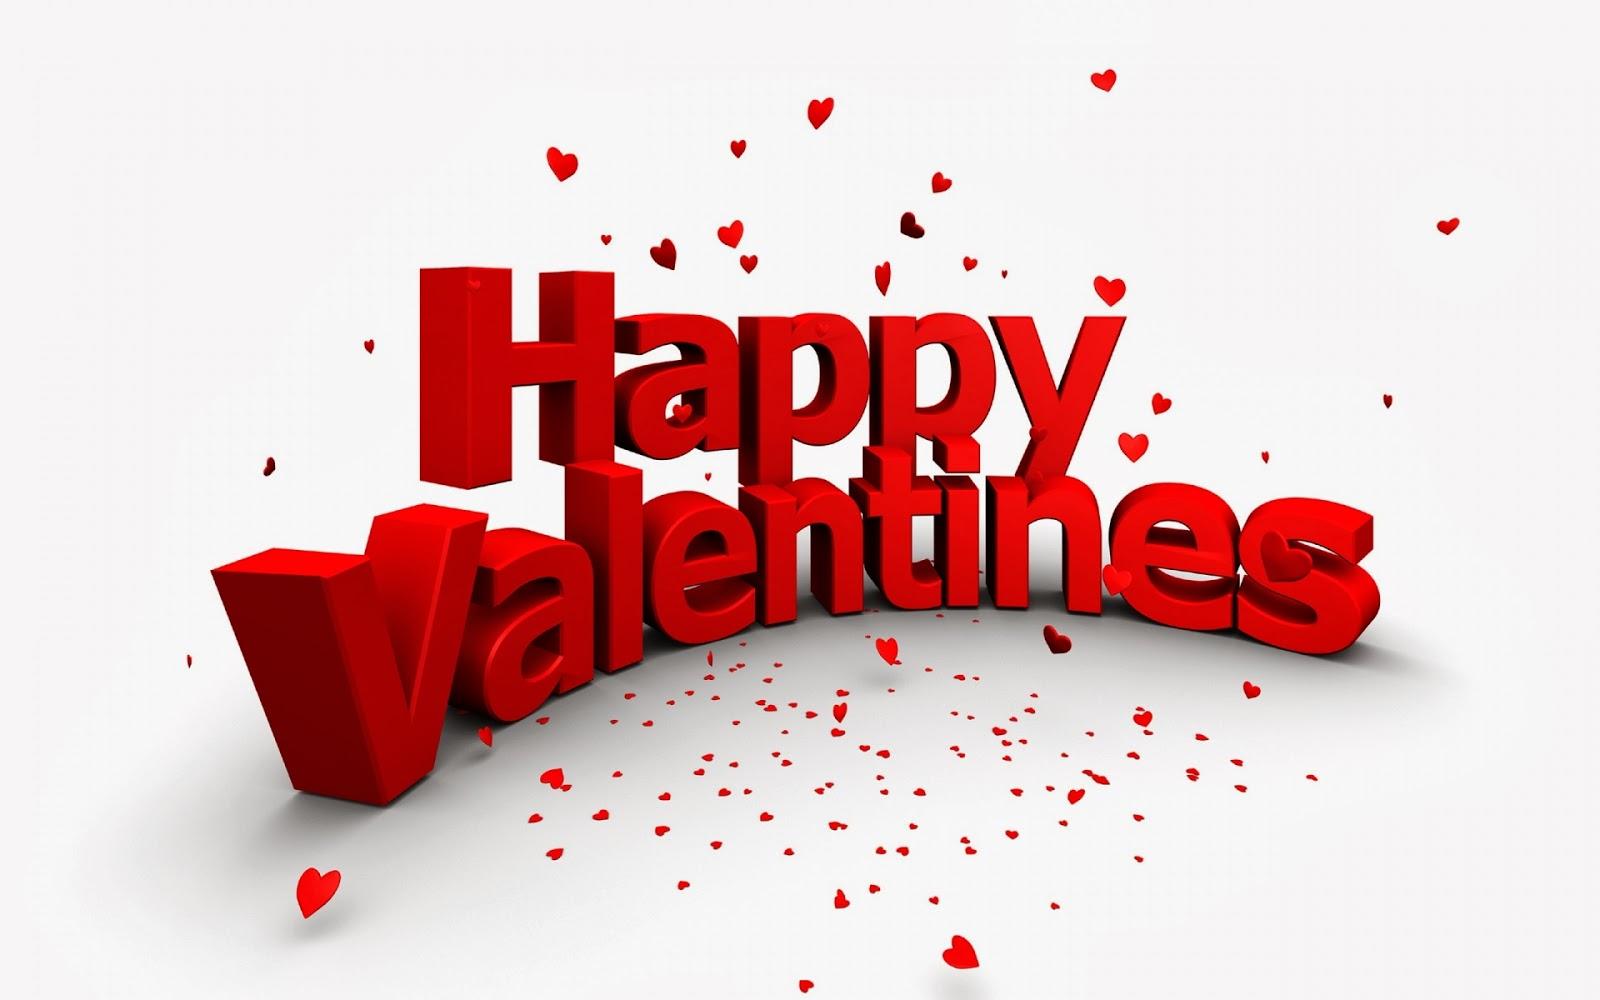 Happy Valentines Red 3d Text White BG HD